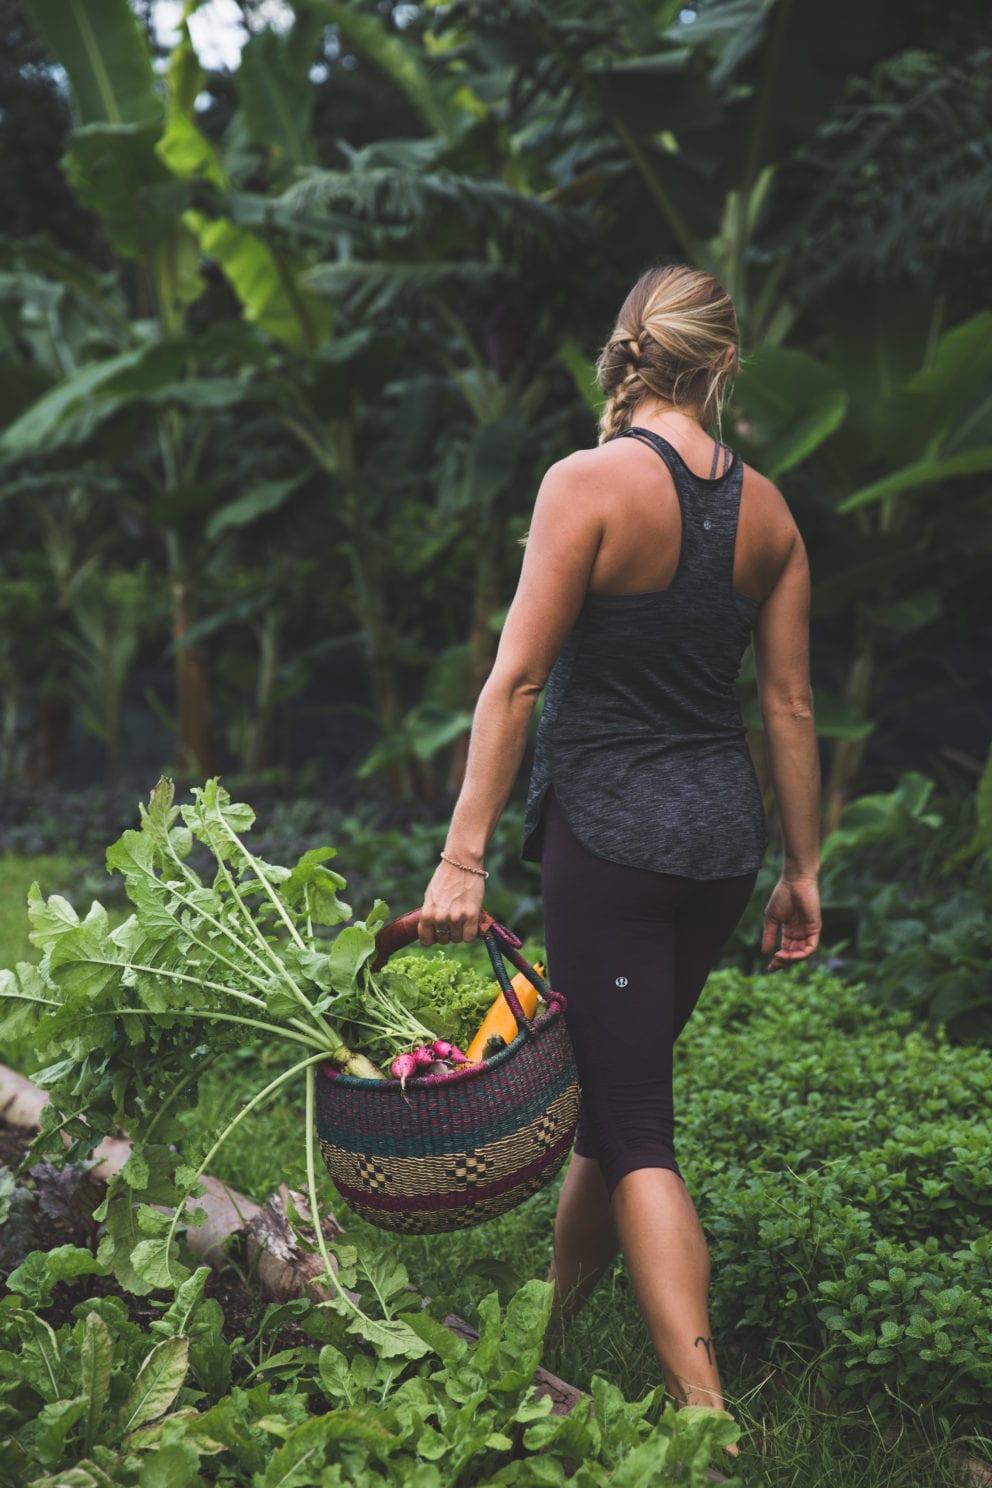 woman holding vegetable basket walking in green farm